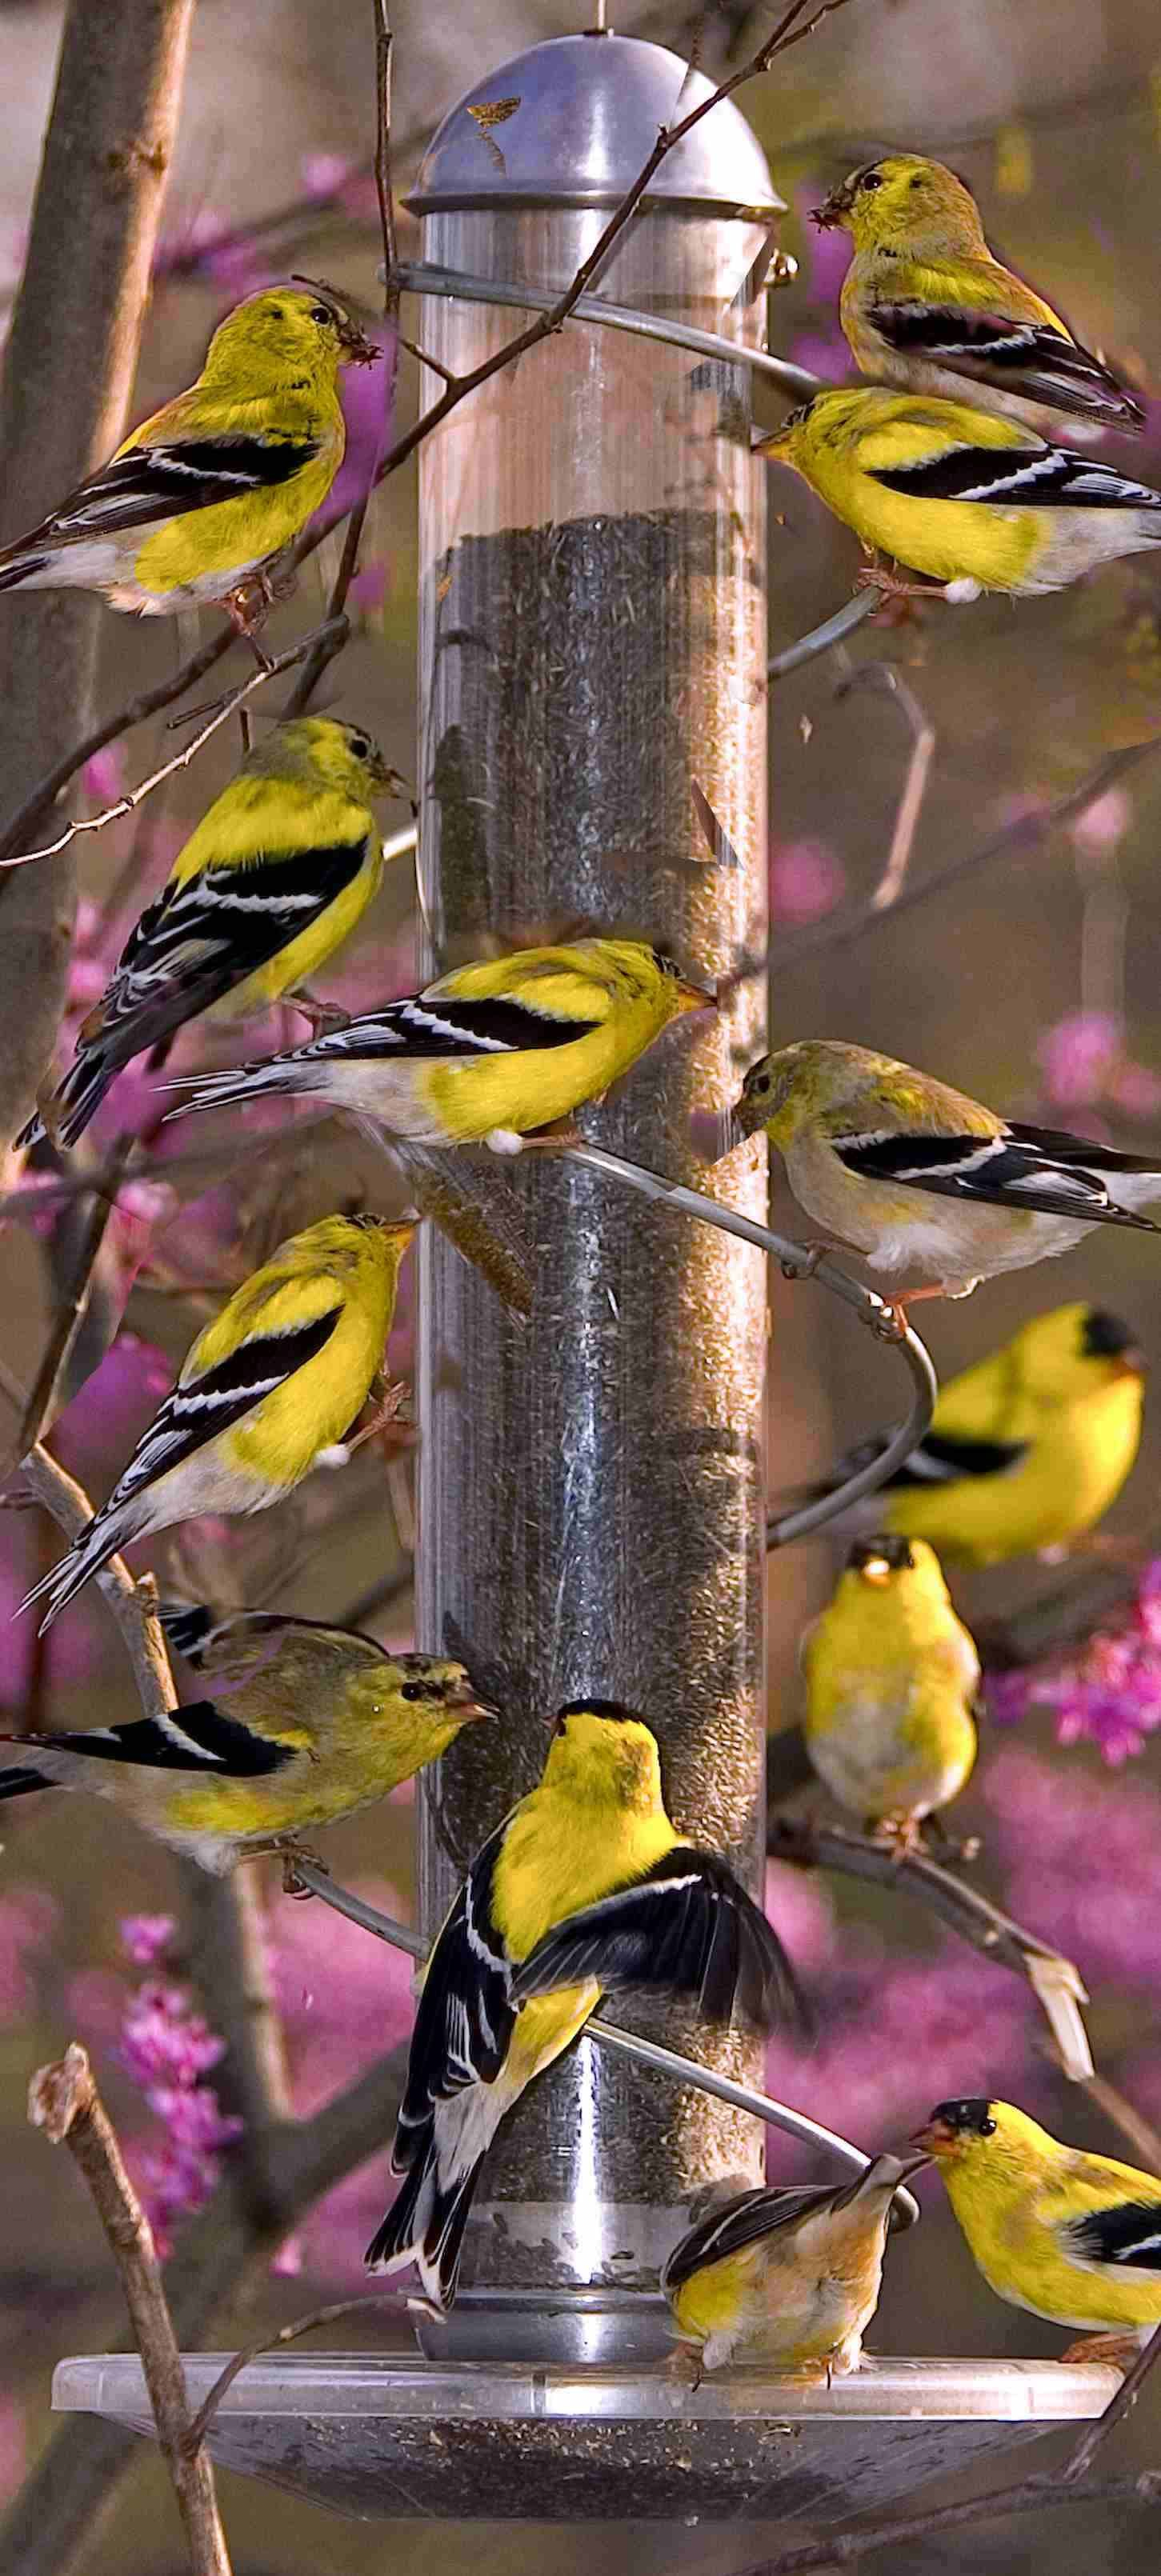 17 In Metal Spiral Finch Tube Feeder Finch Feeders Birds Bird Feeders